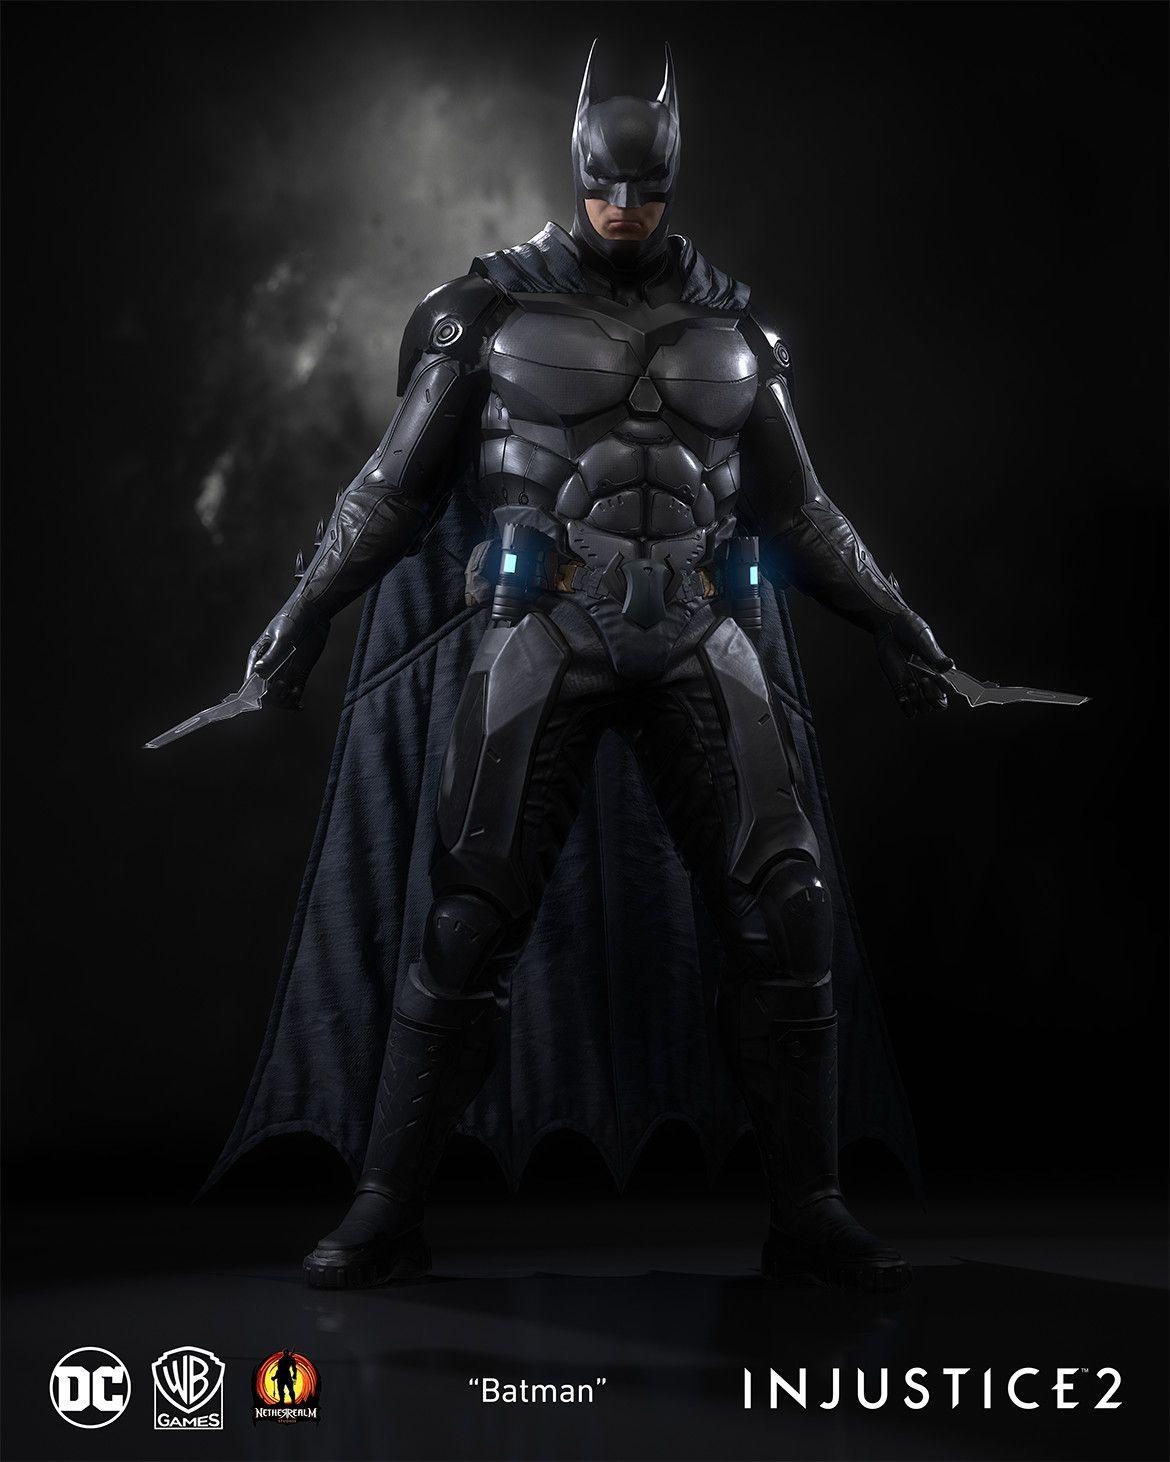 Pin By Barnettj On Dc Batman Injustice Batman Injustice 2 Batman